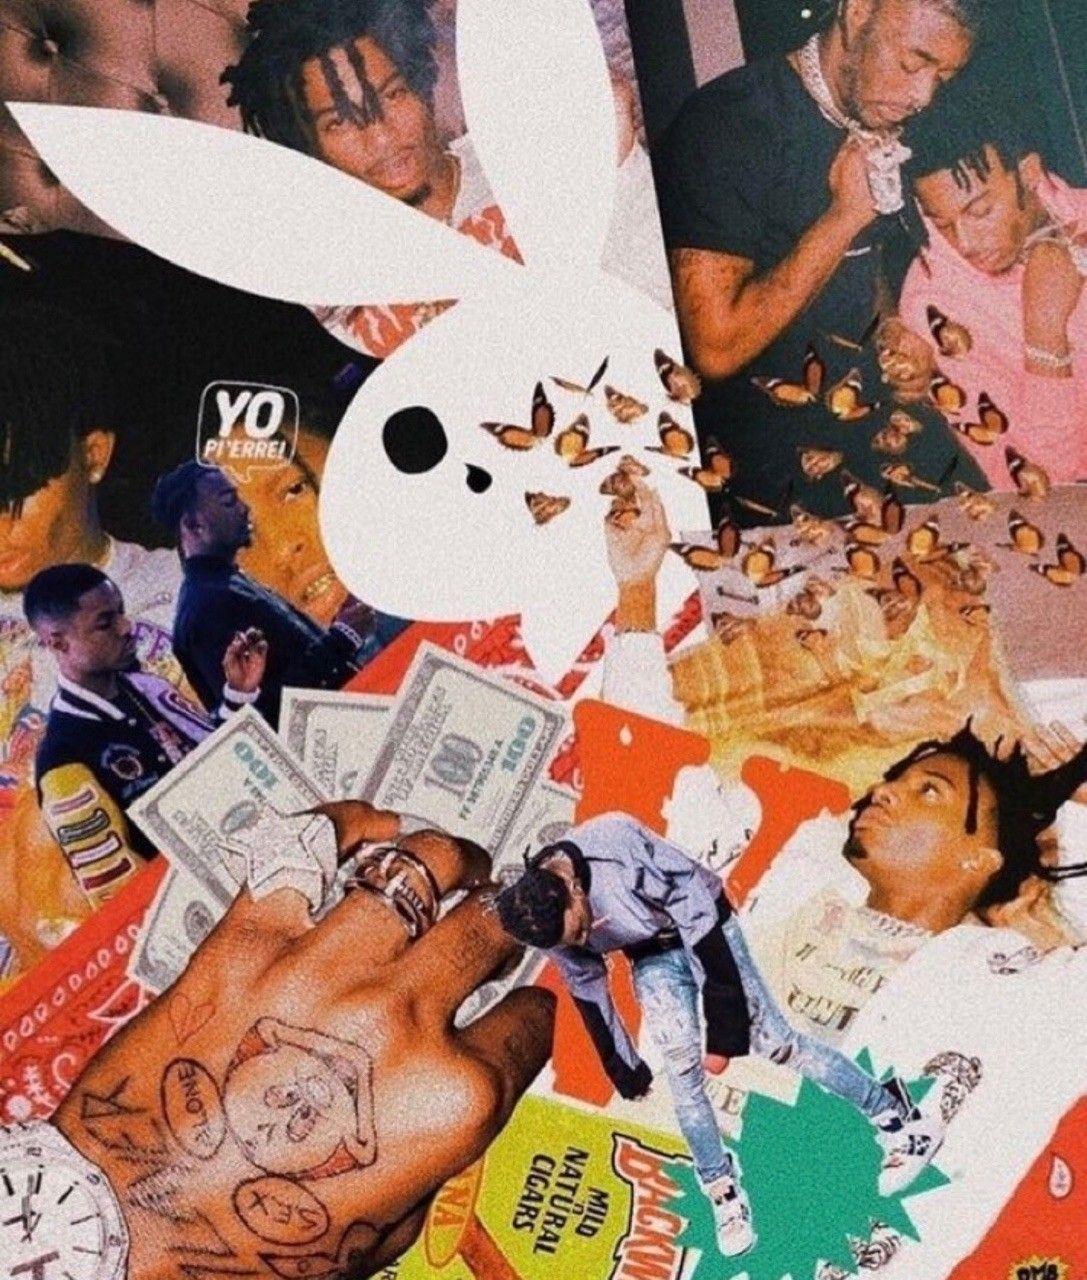 Pin Lillieataylor Insta Lillieeataylorr Rap Wallpaper